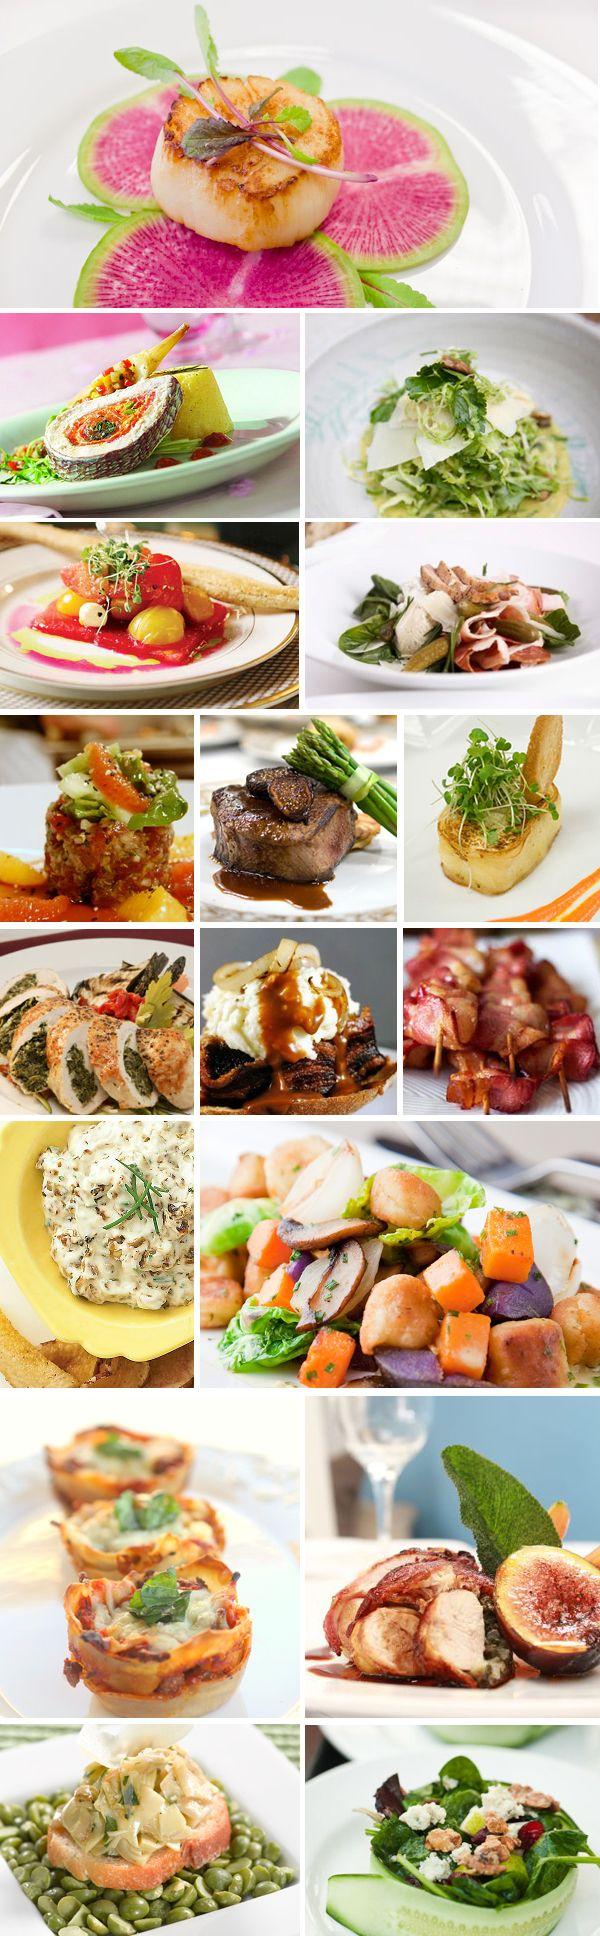 63 creative wedding reception food for Best food for wedding reception